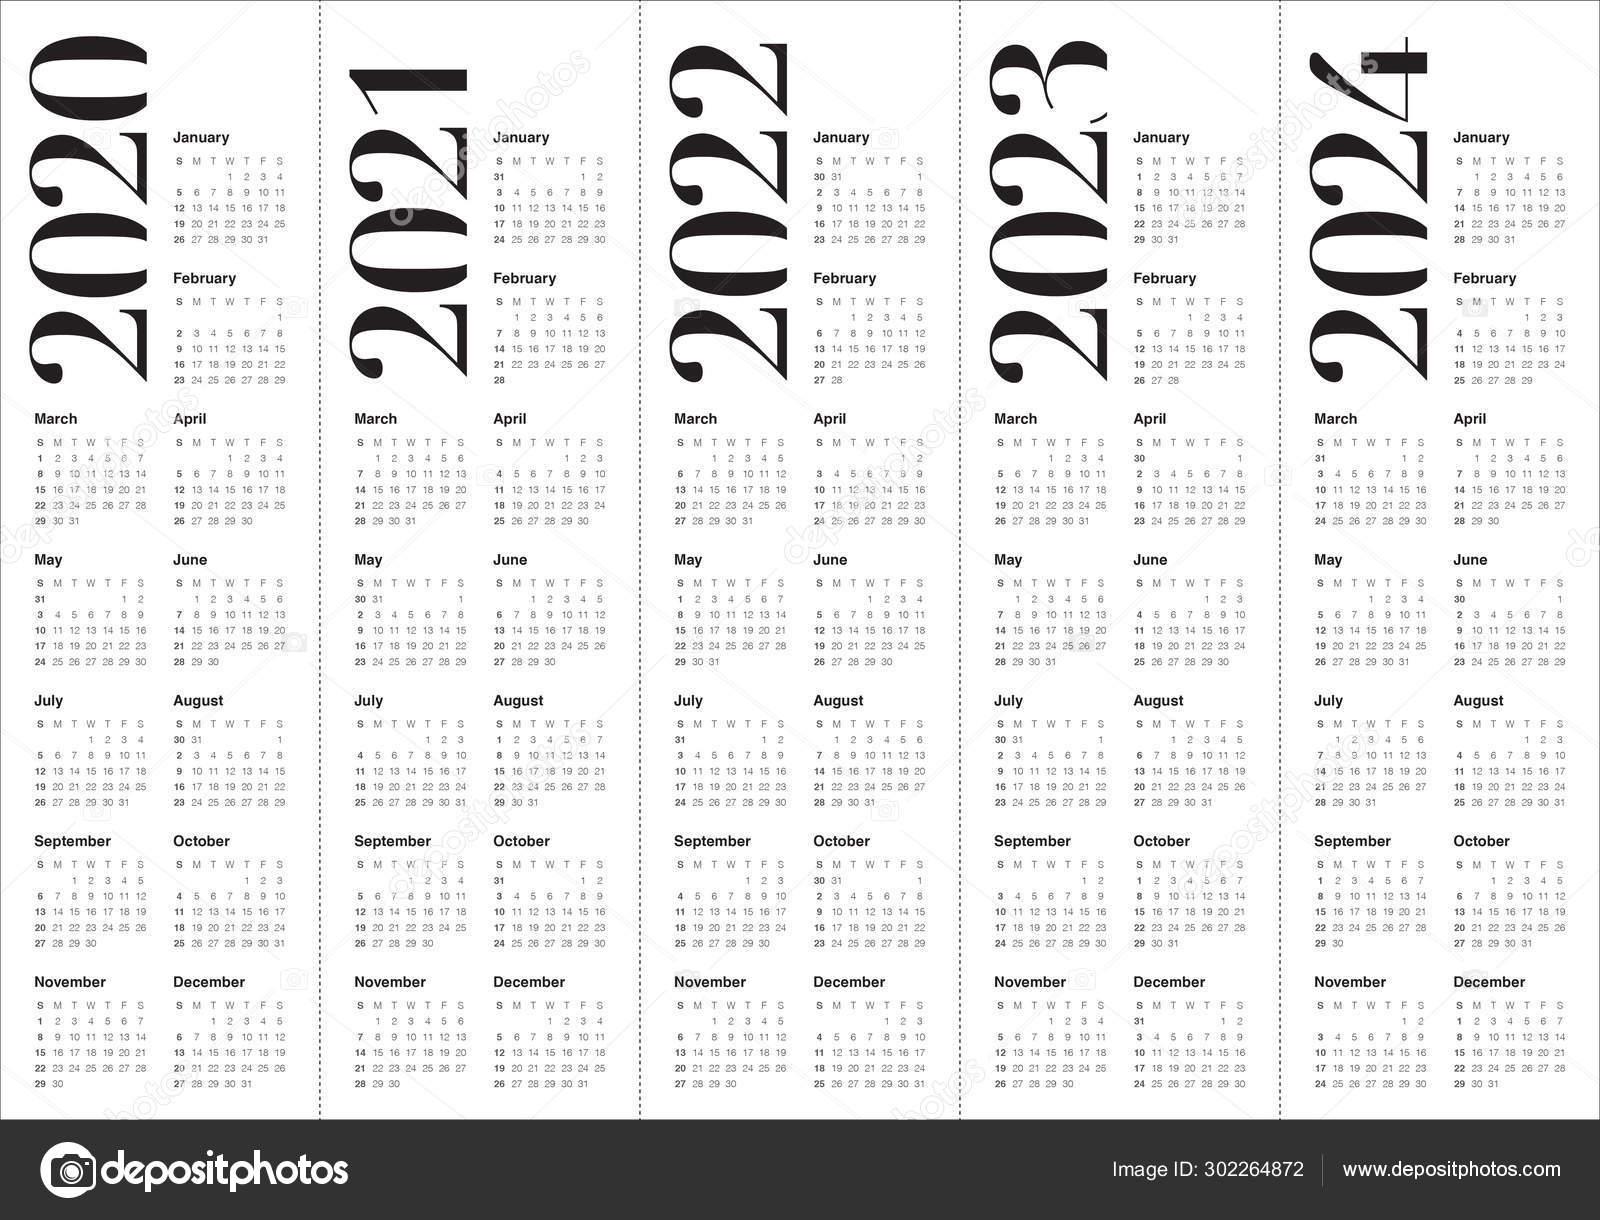 2022 2023 Printable Calendar.Qn121zvvv4qzbm